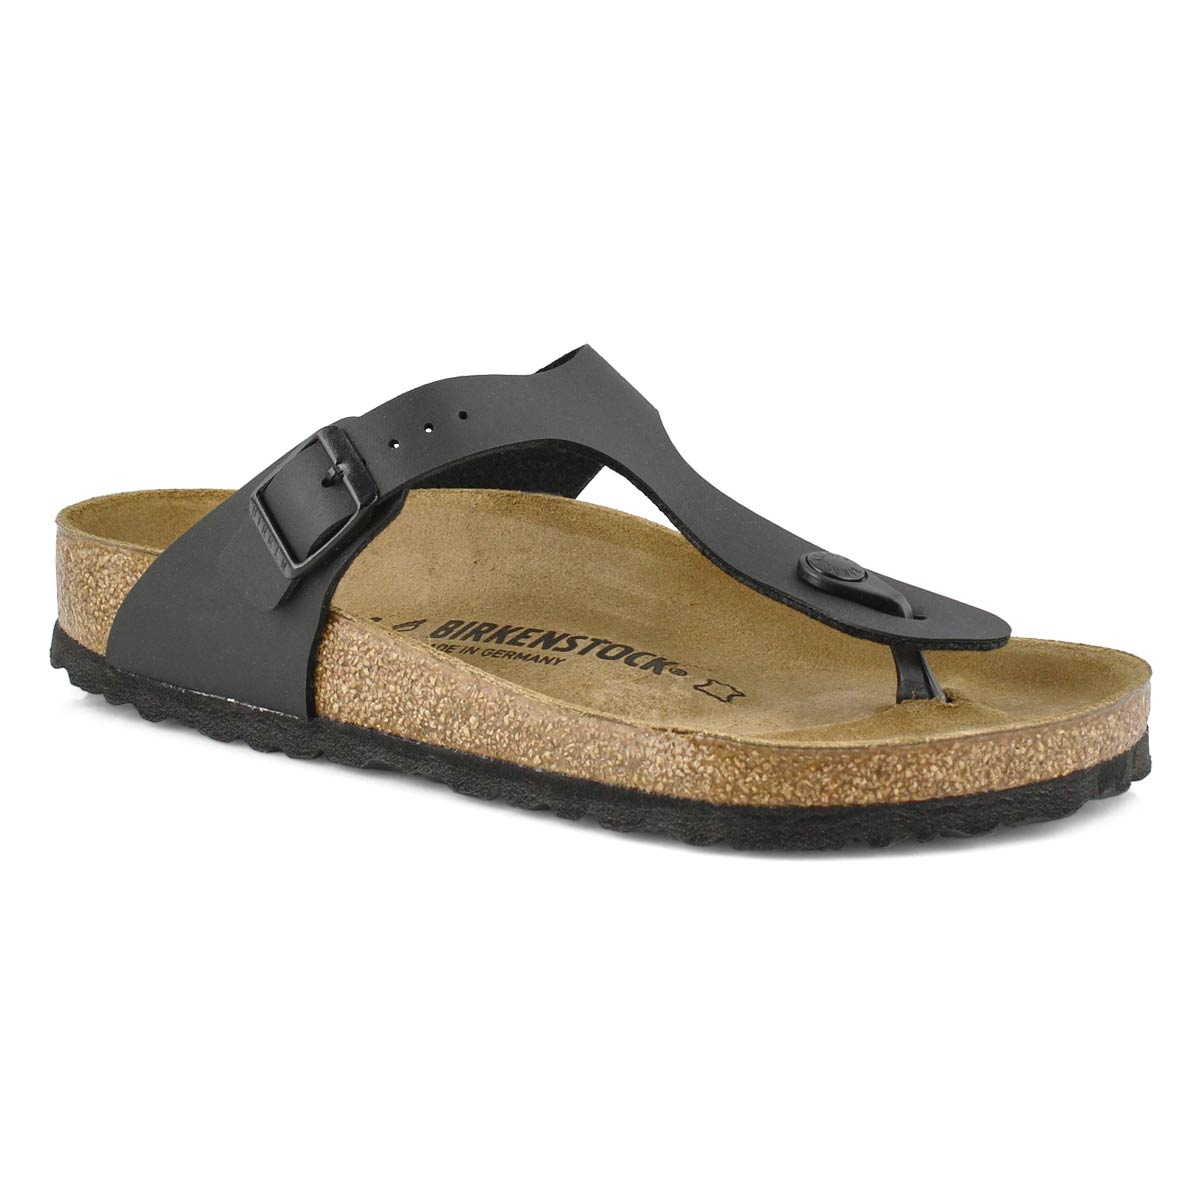 Lds Gizeh blk thong sandal